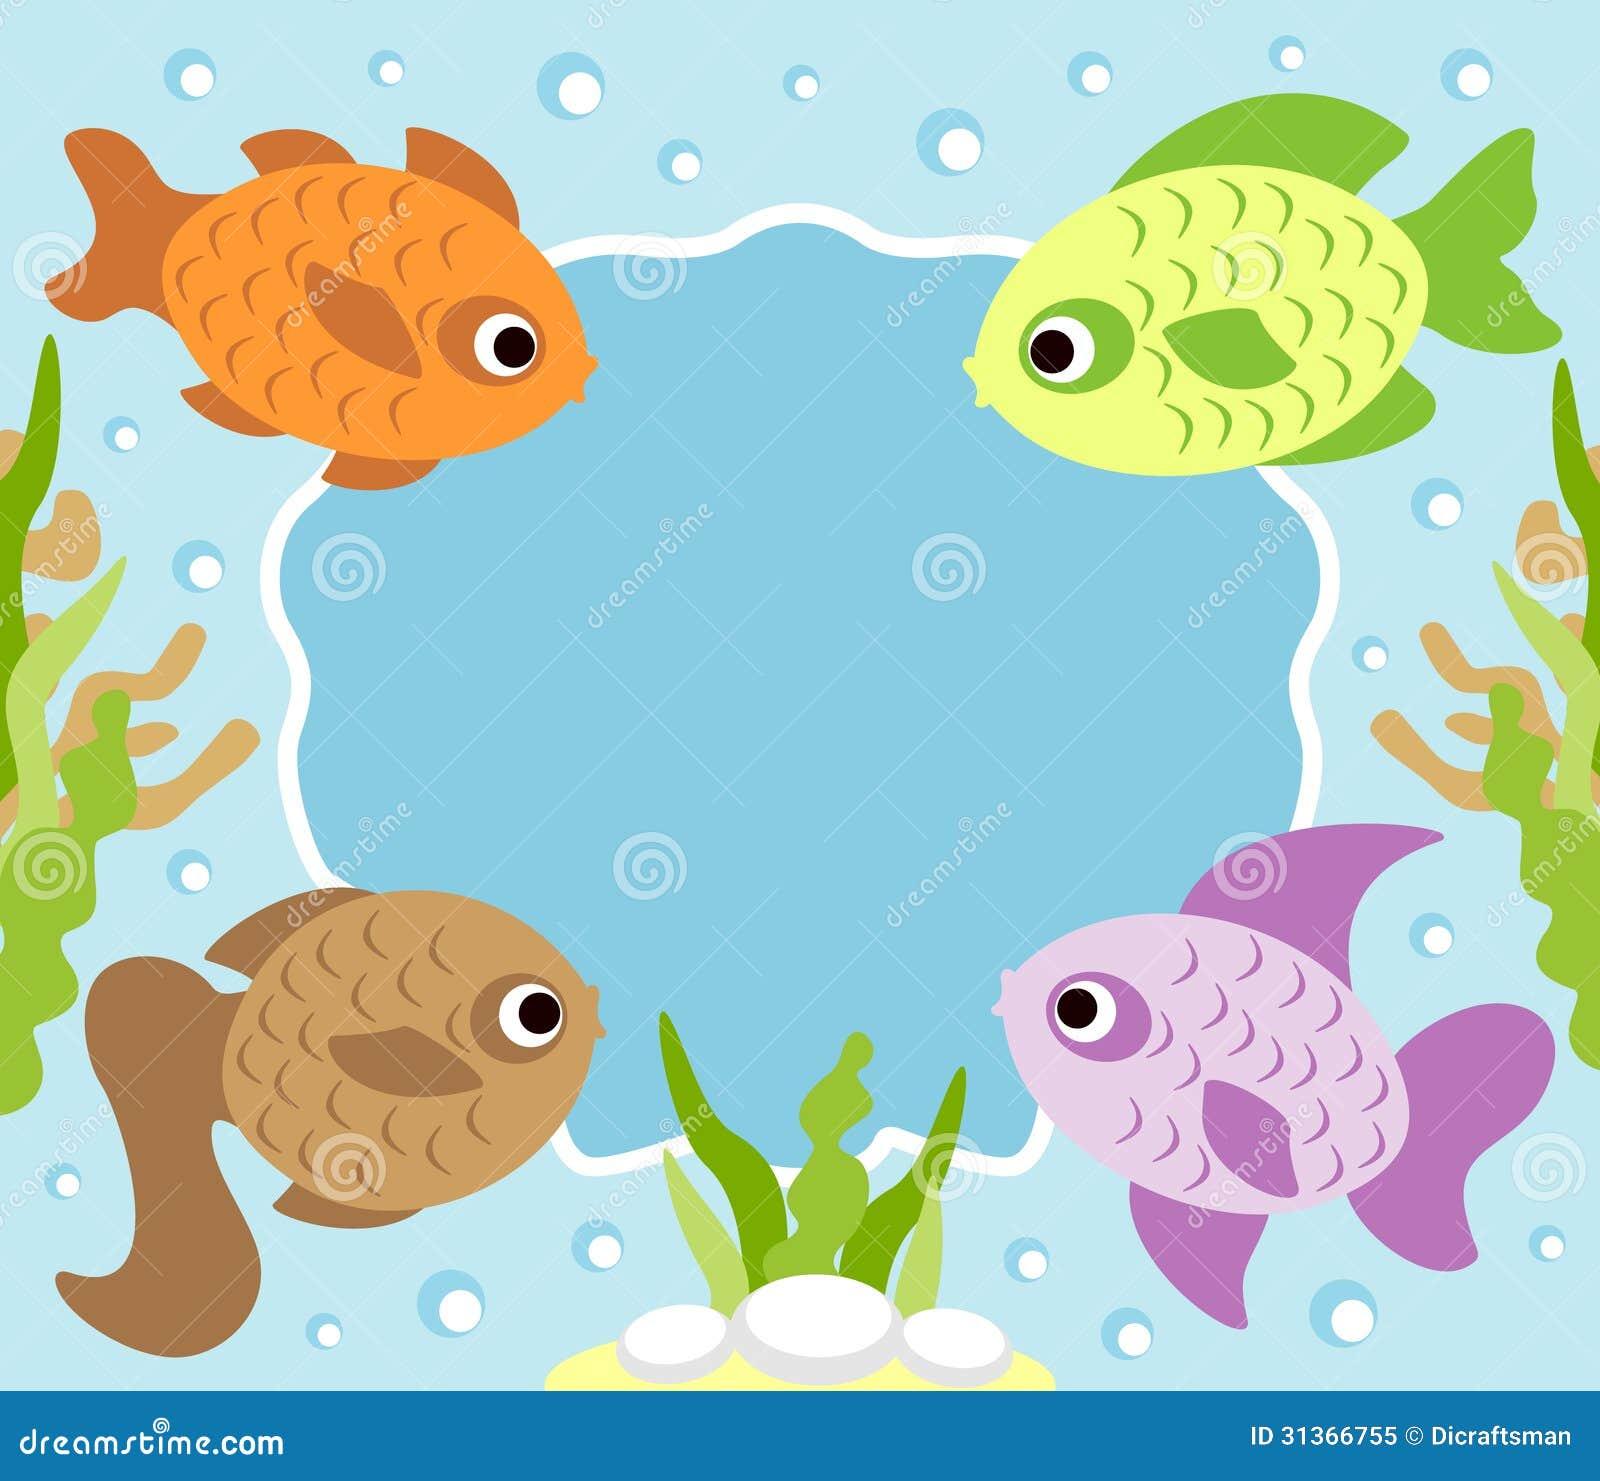 Cartoon Background With Fish Royalty Free Stock Photo - Image ...